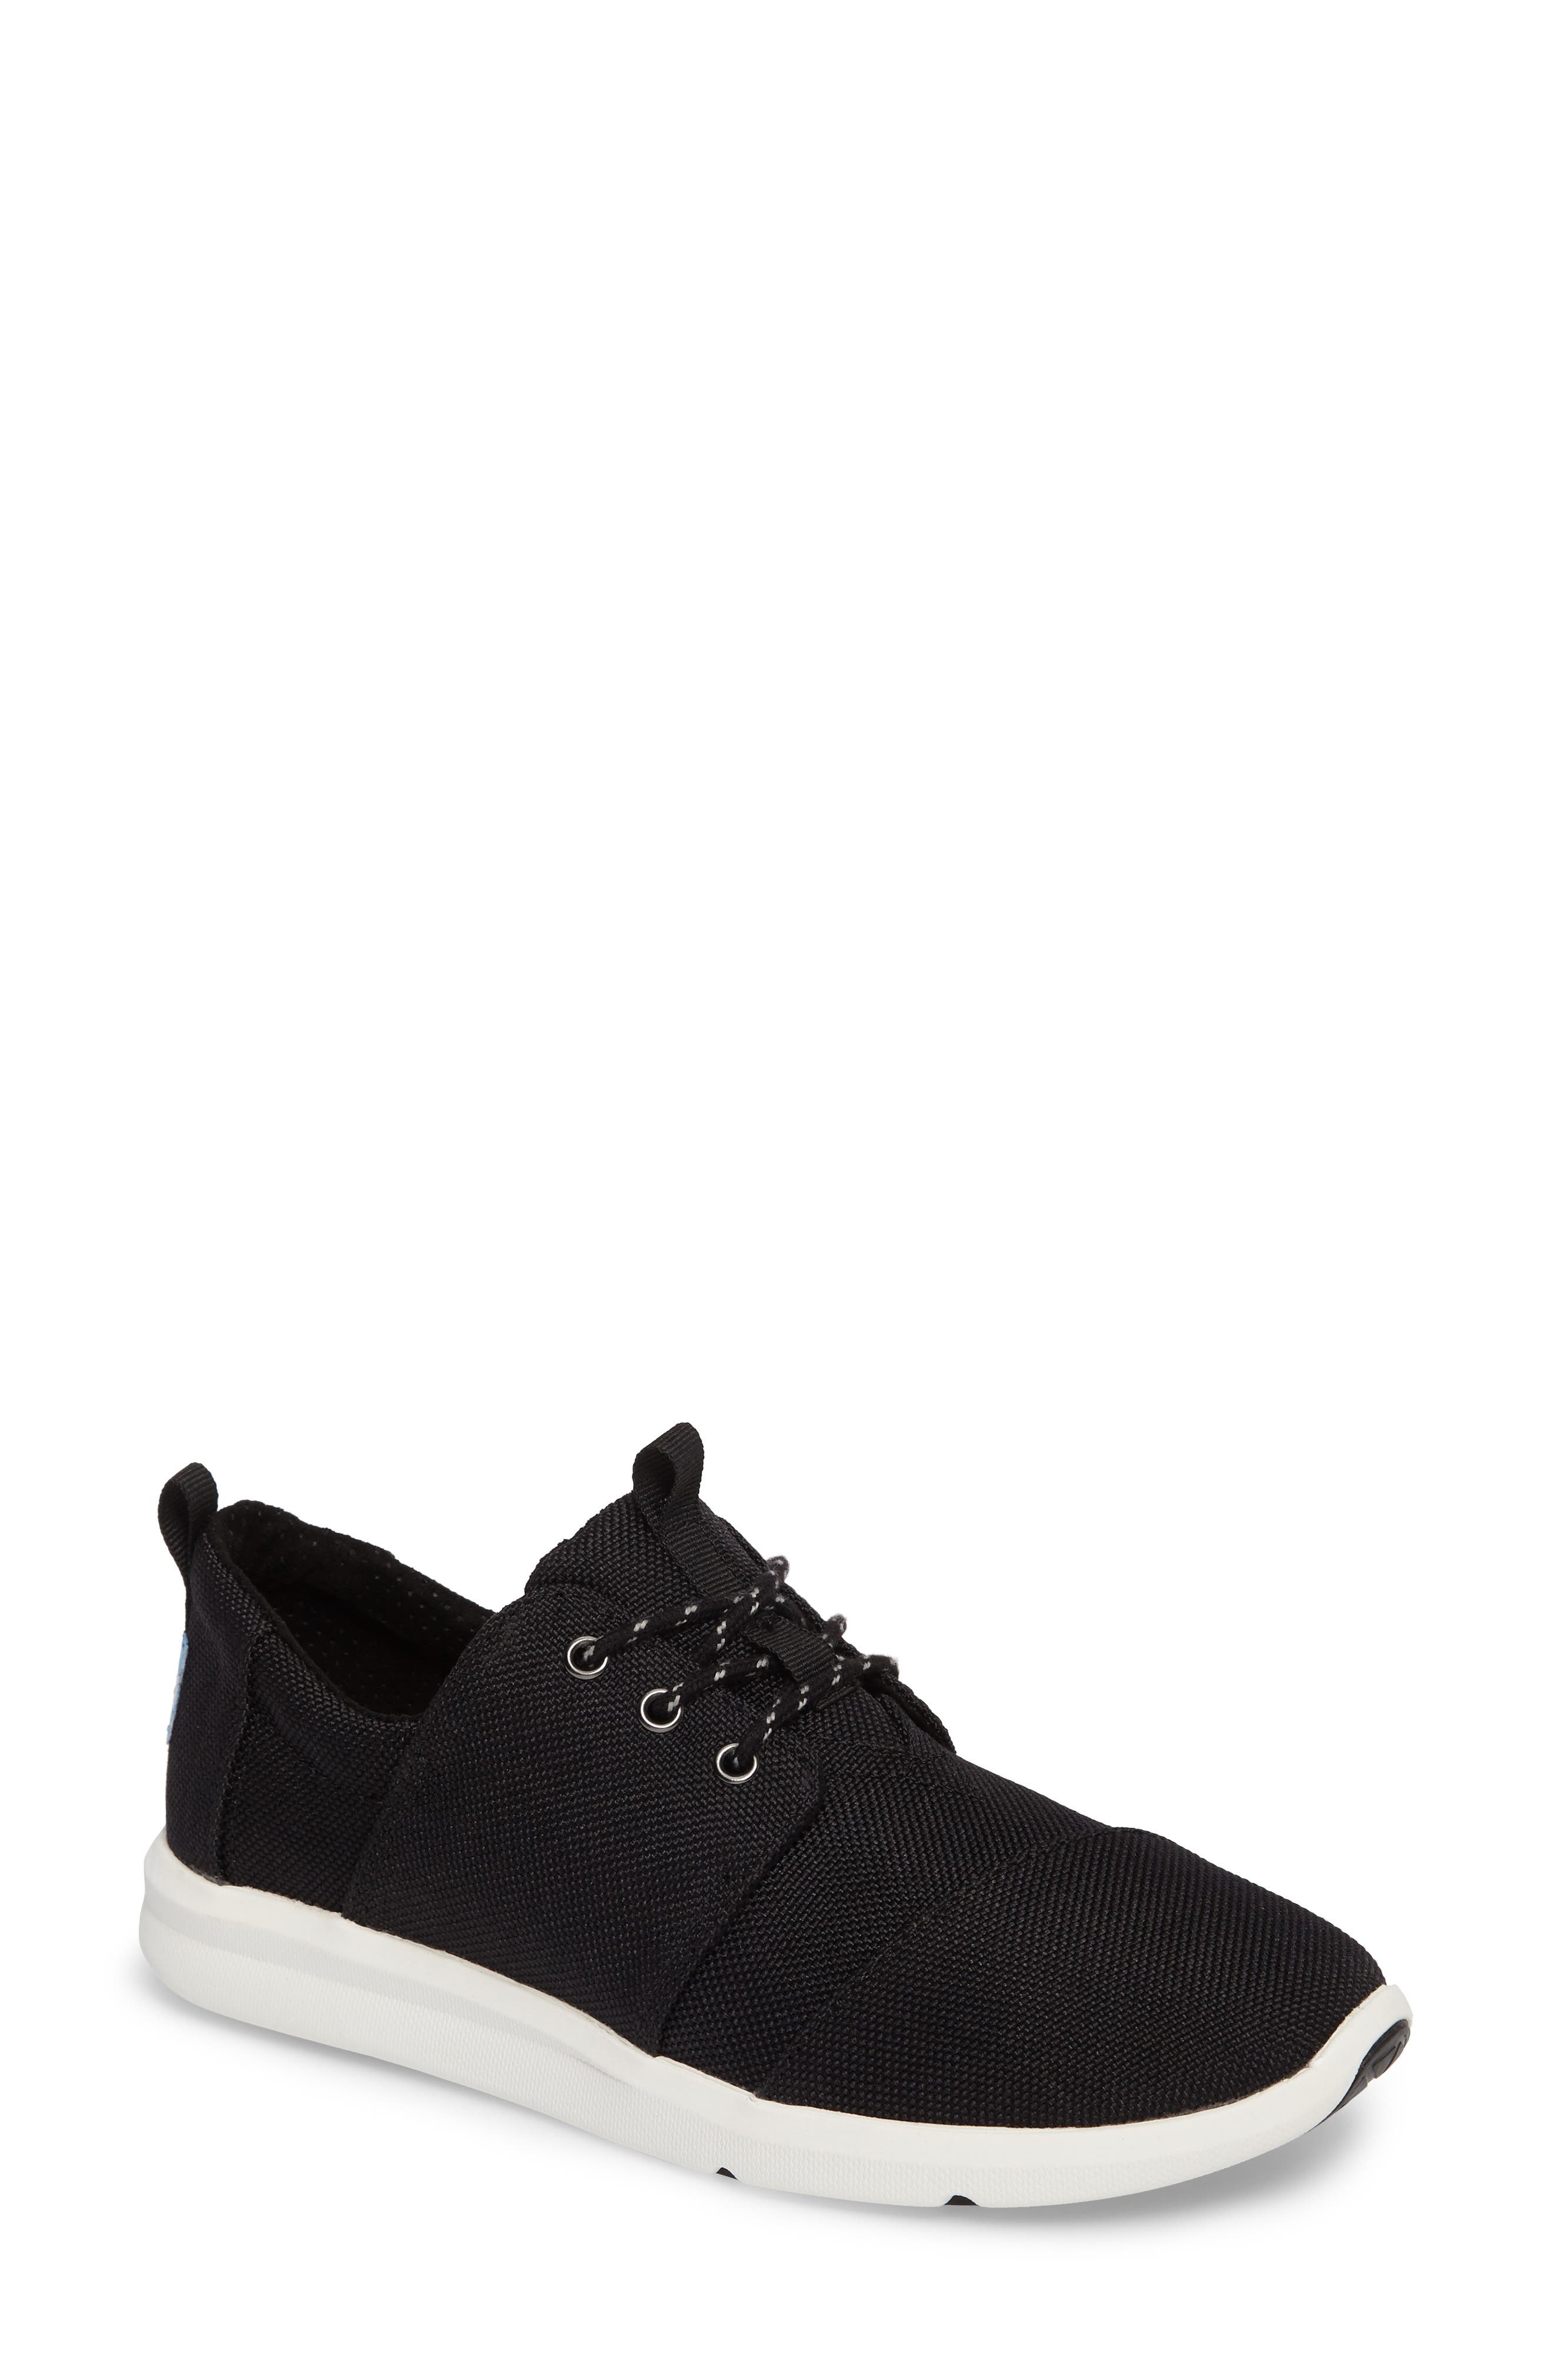 Del Ray Sneaker,                         Main,                         color, 002